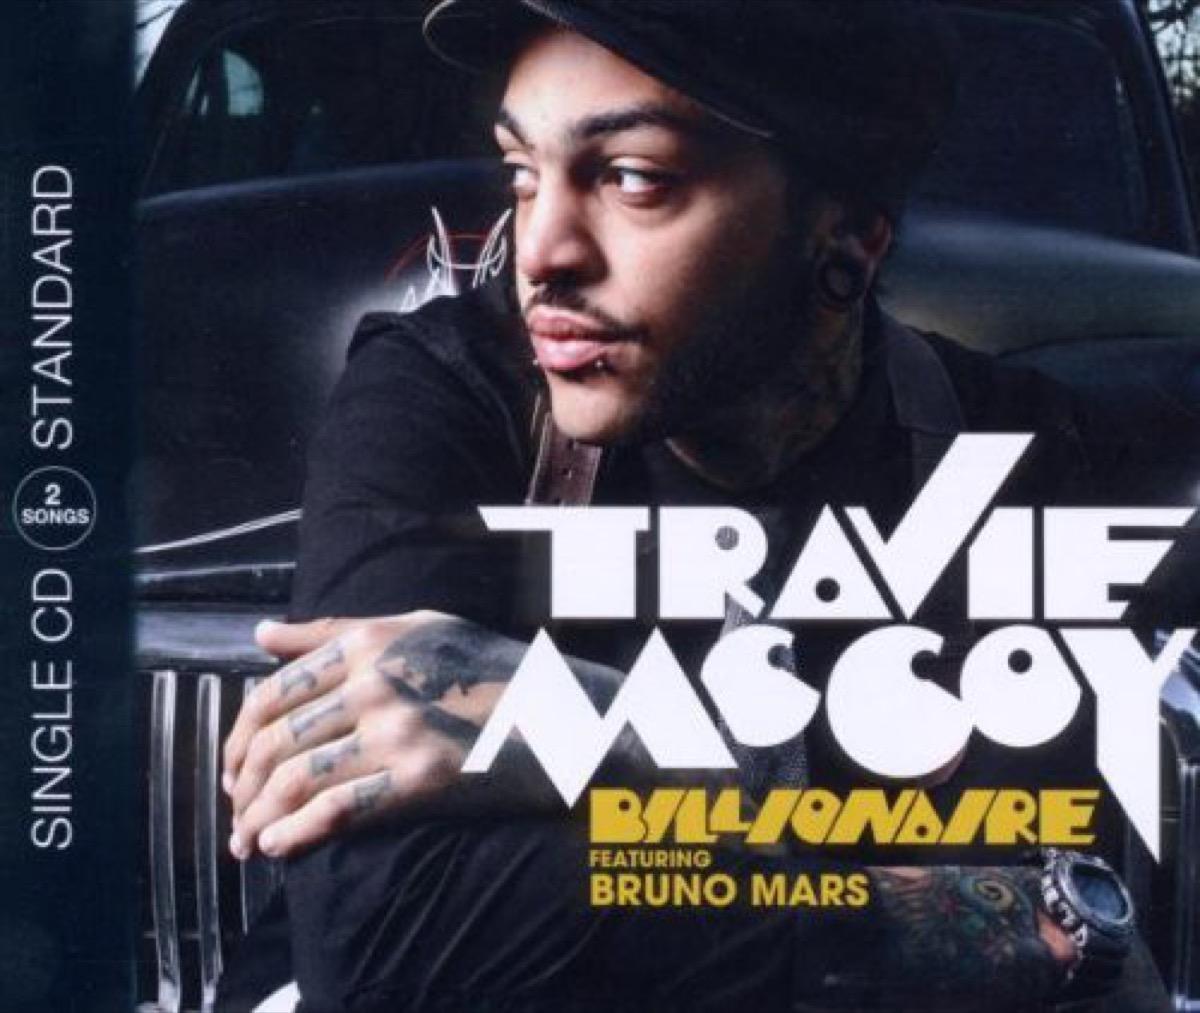 Travie McCoy Billionaire album